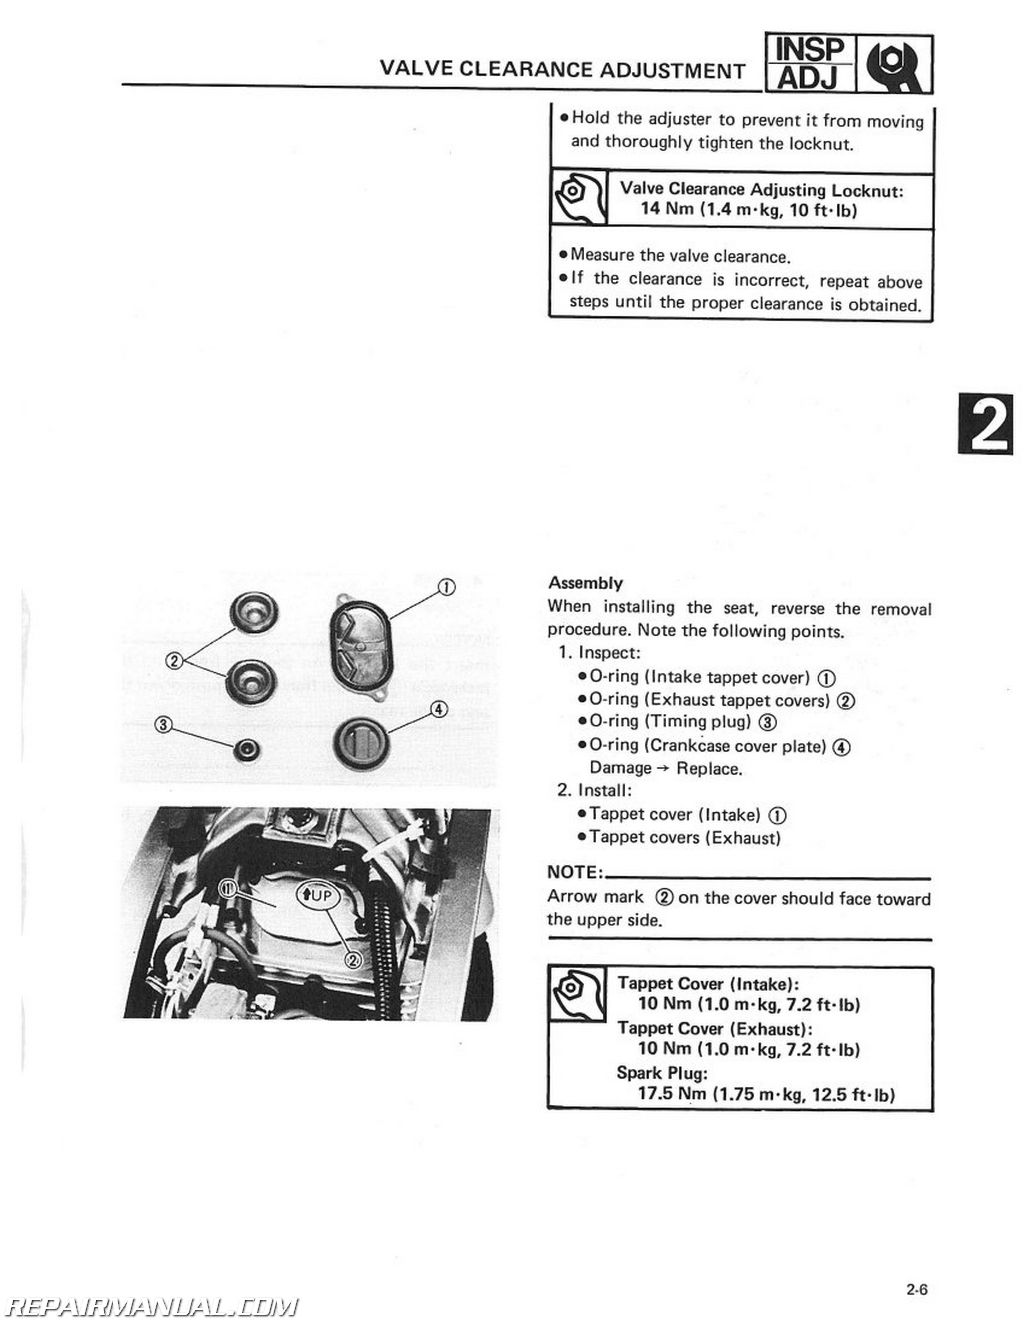 1986 yamaha srx600s sc service manual. Black Bedroom Furniture Sets. Home Design Ideas